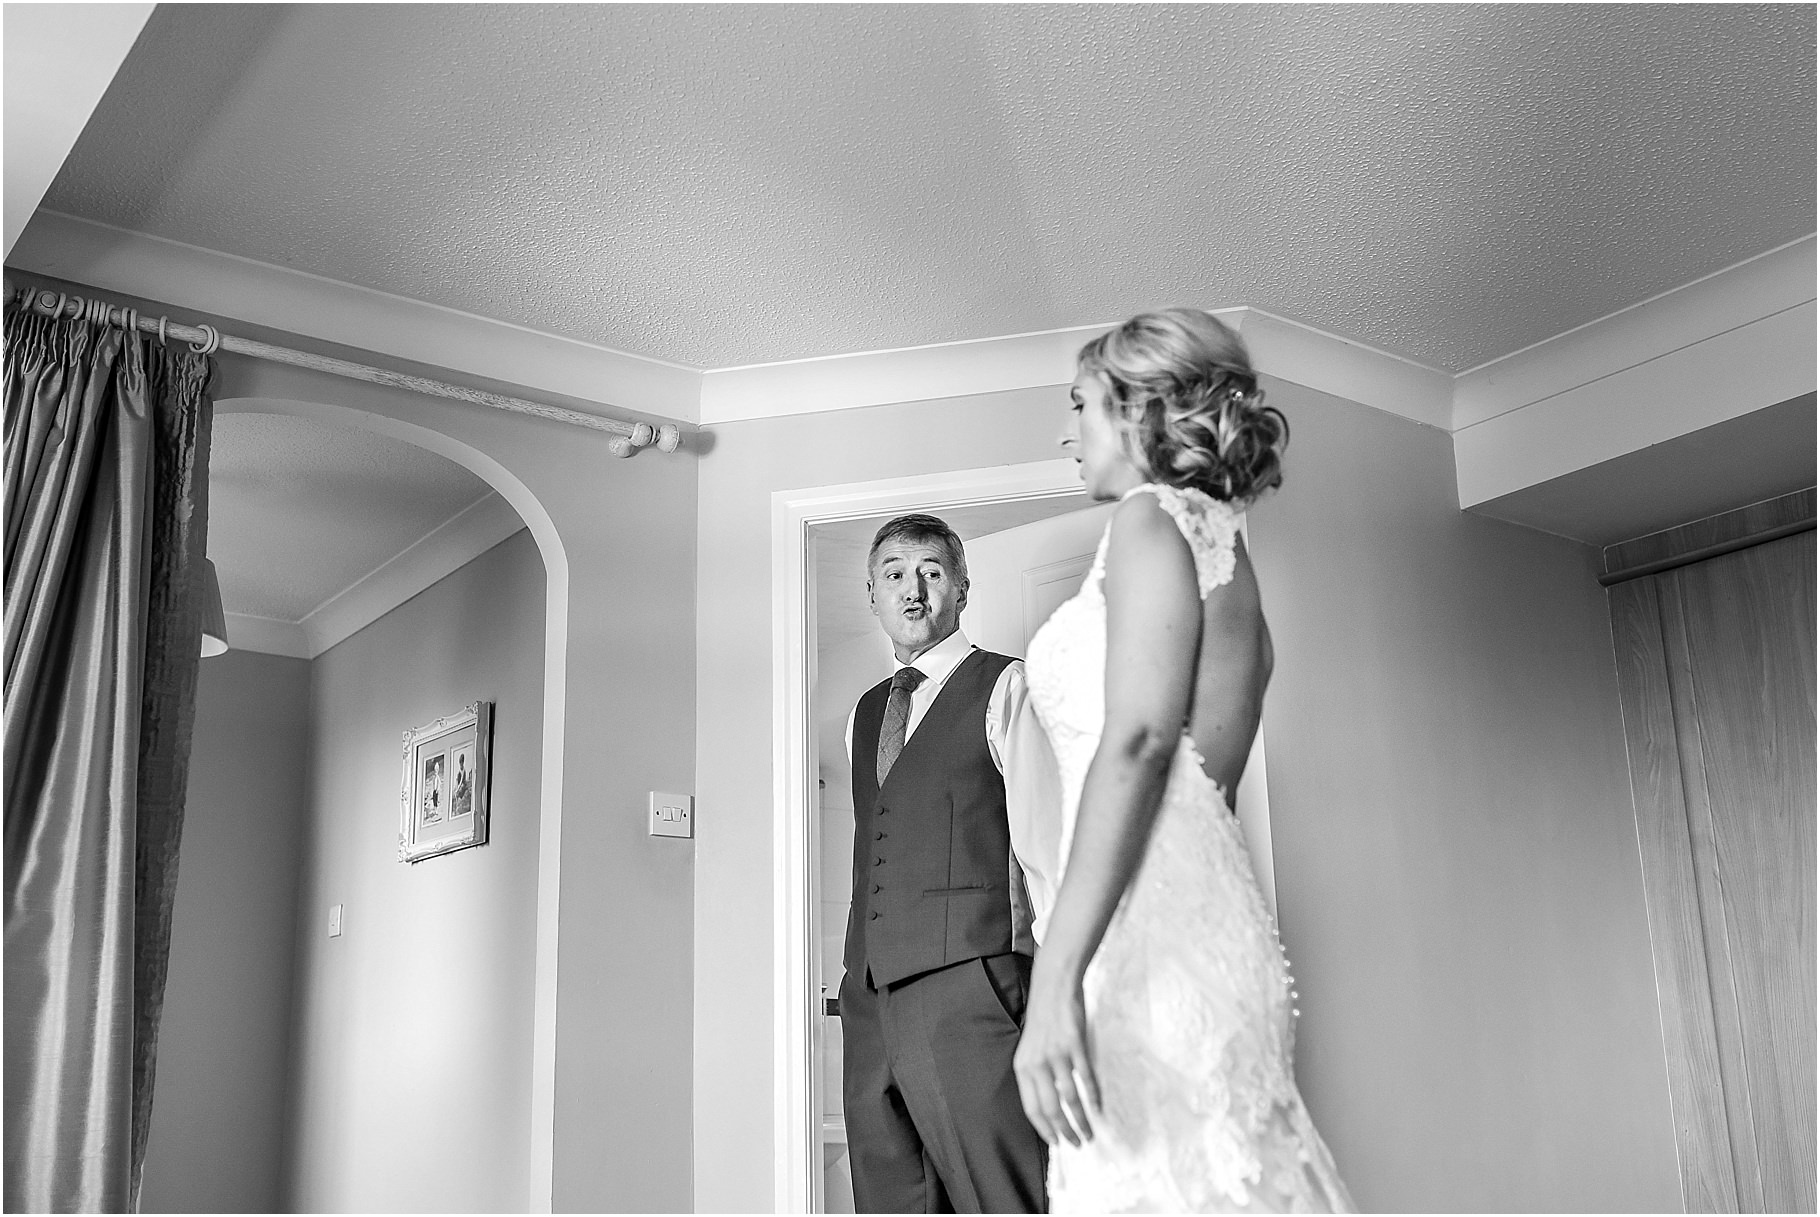 bartle-hall-wedding-photography-024.jpg